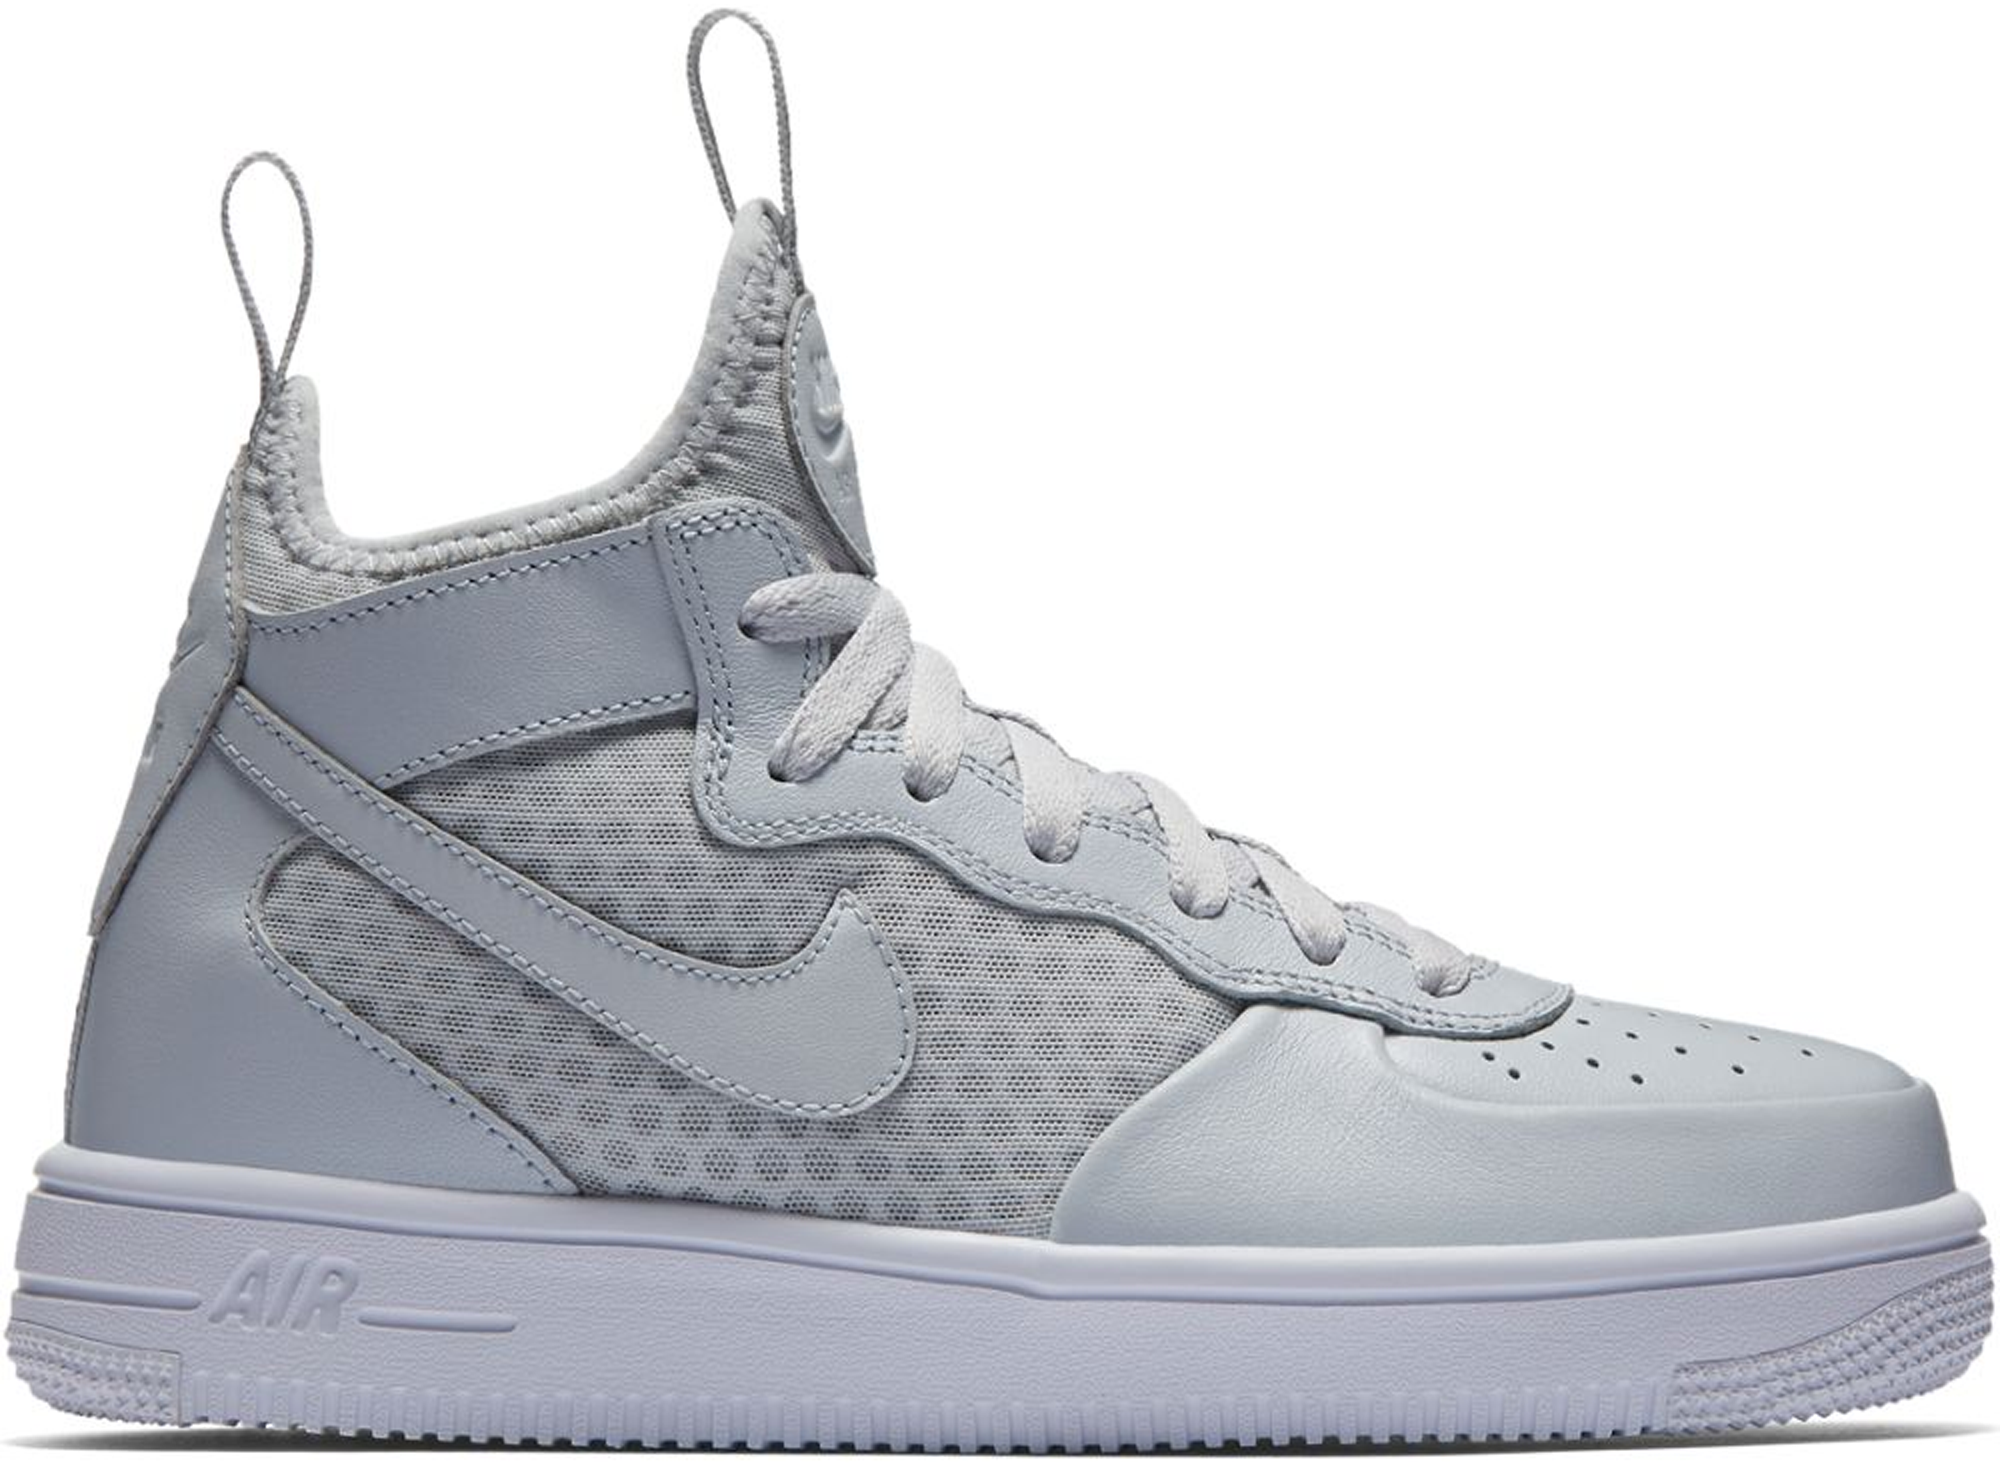 Nike Air Force 1 Ultraforce Mid Grey